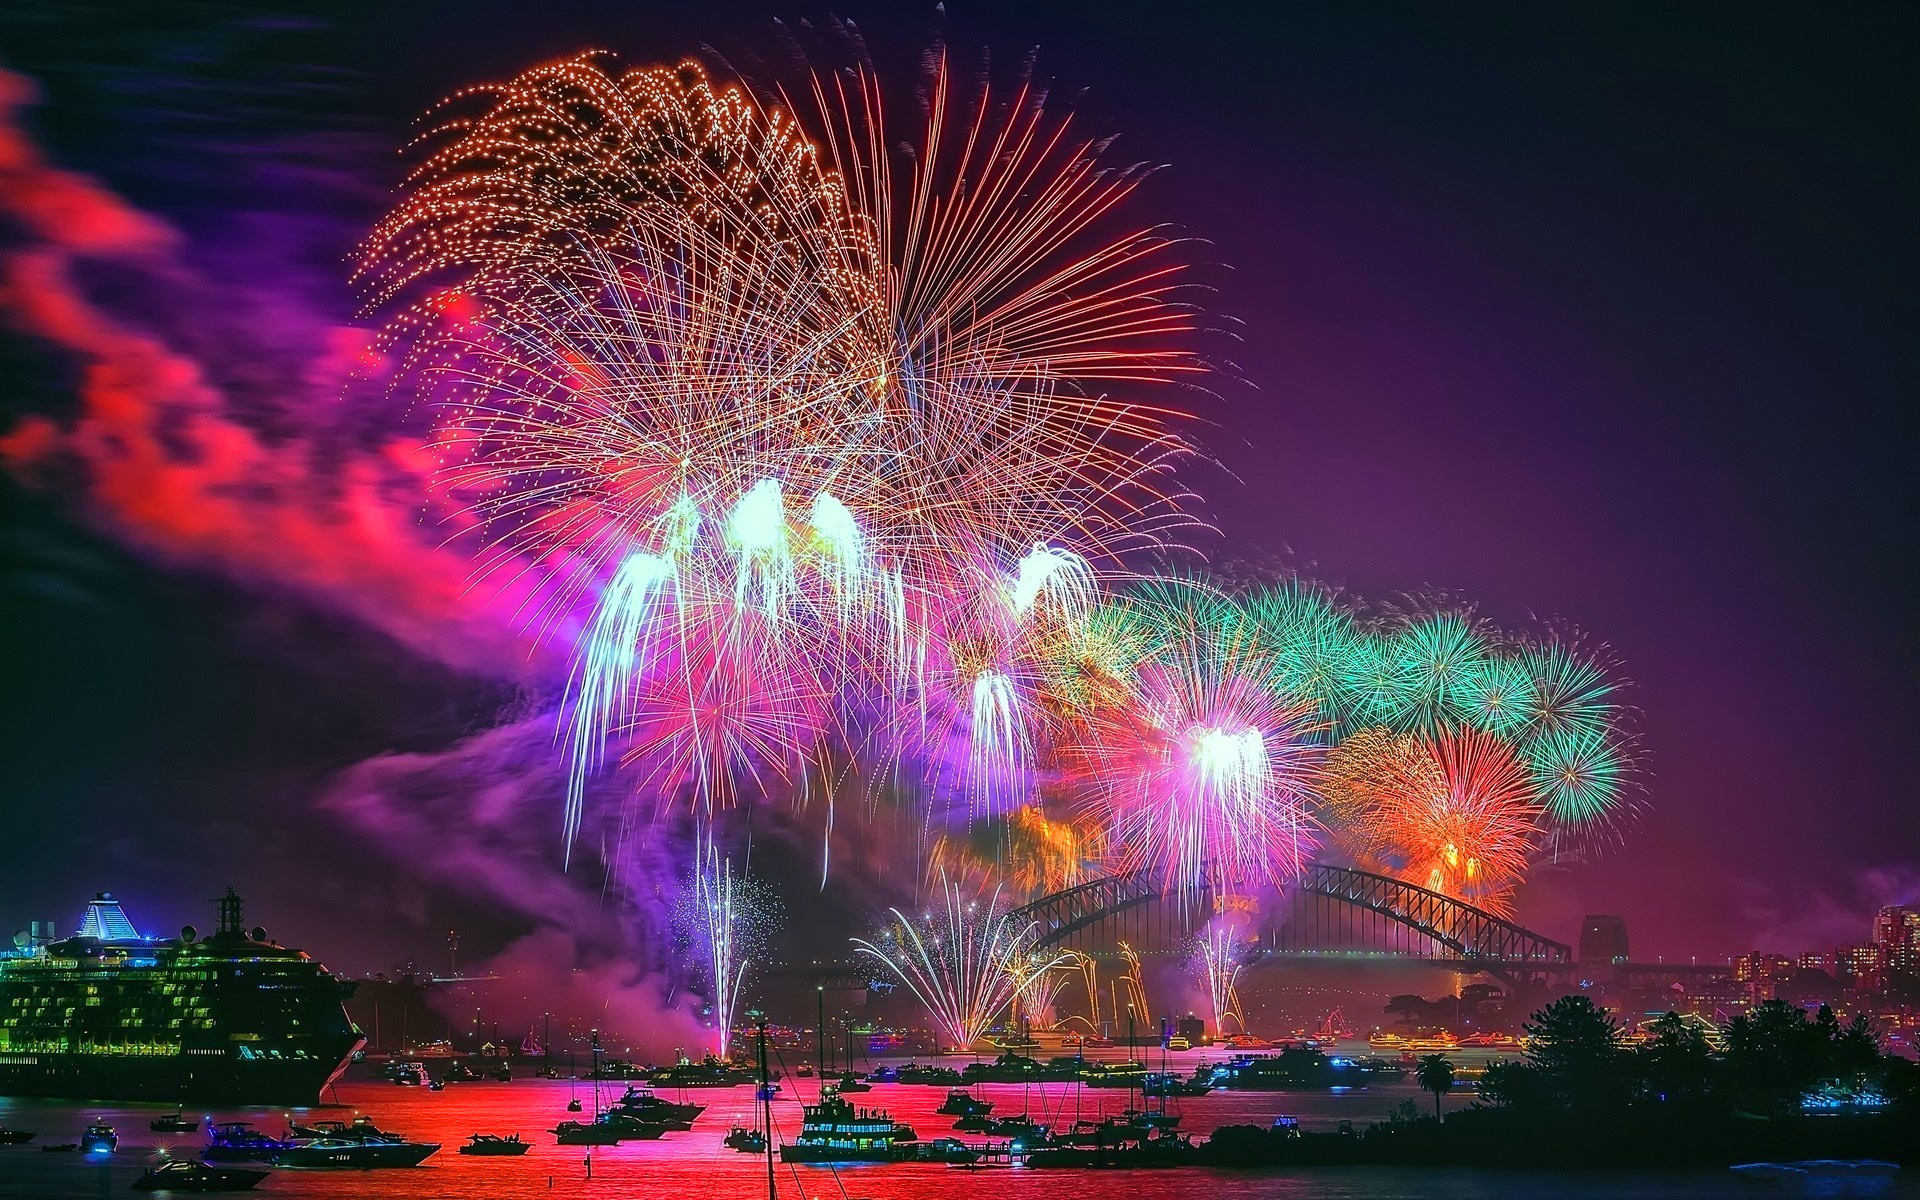 Fireworks Wallpaper for Computer (63+ images)